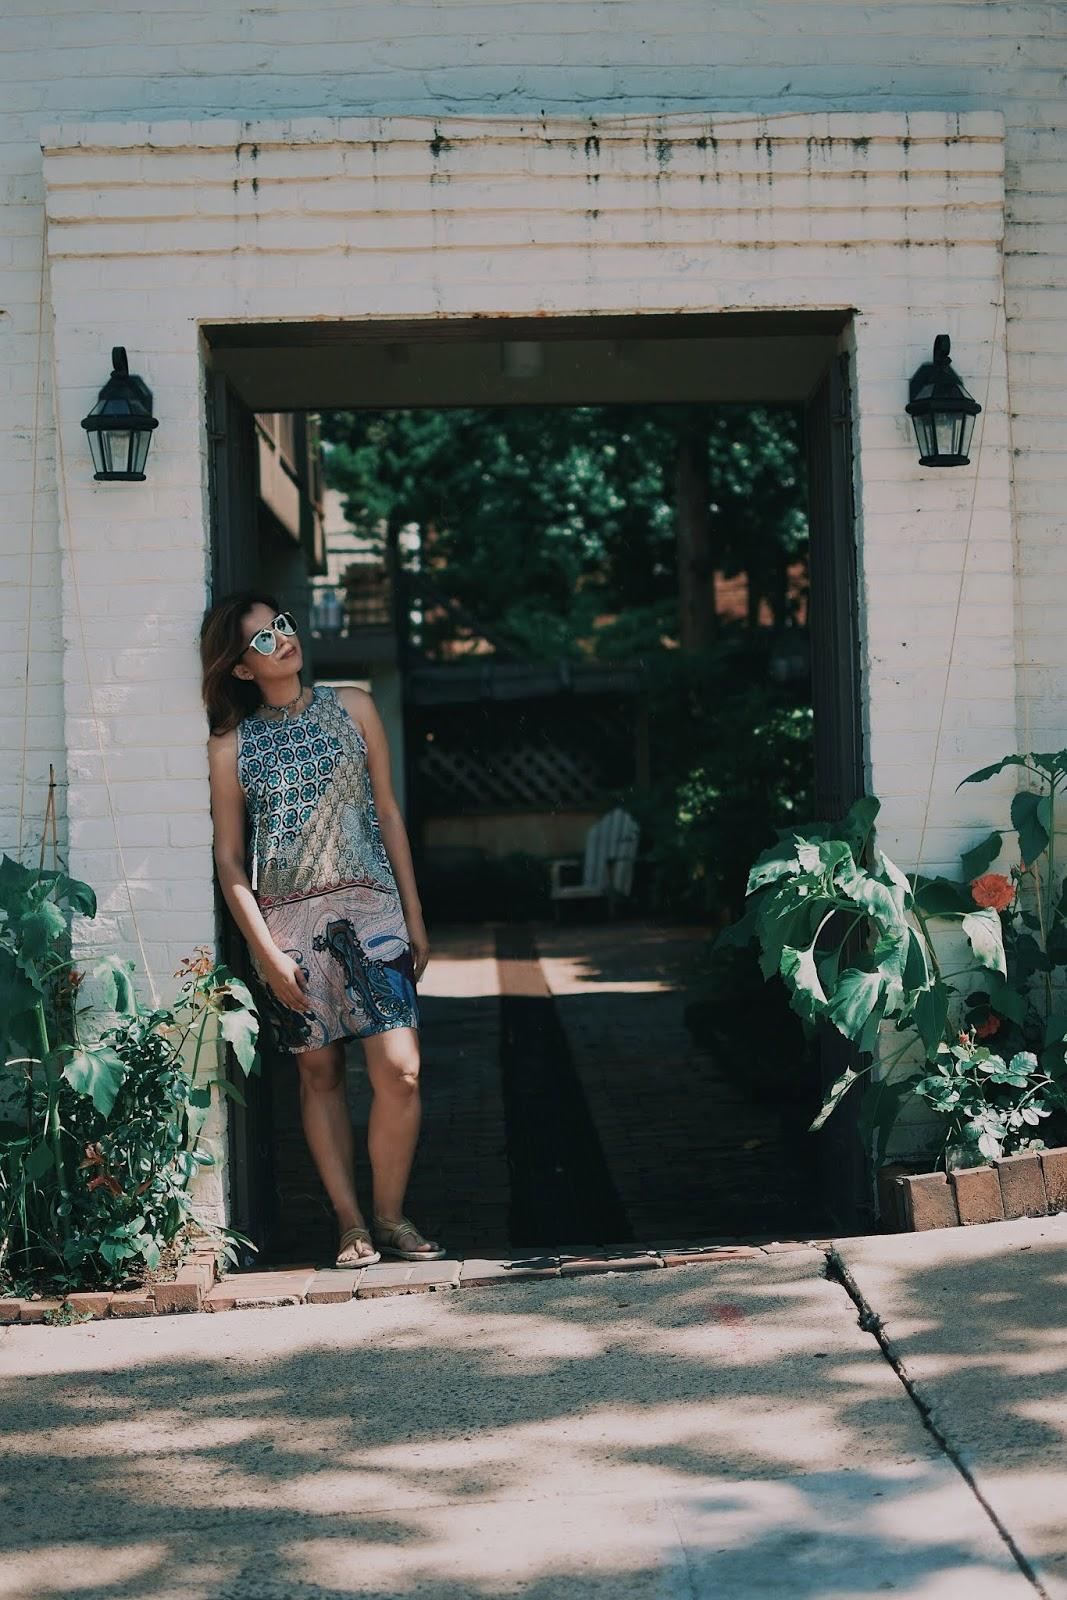 A Summer Dress & Camel Gold Sandals by Mari Estilo-Makemechic-fashionblogger-streetstyle-mariestilotravels-travelblogger-nalho-instagrammer-itgirl-travelblog-fashionista